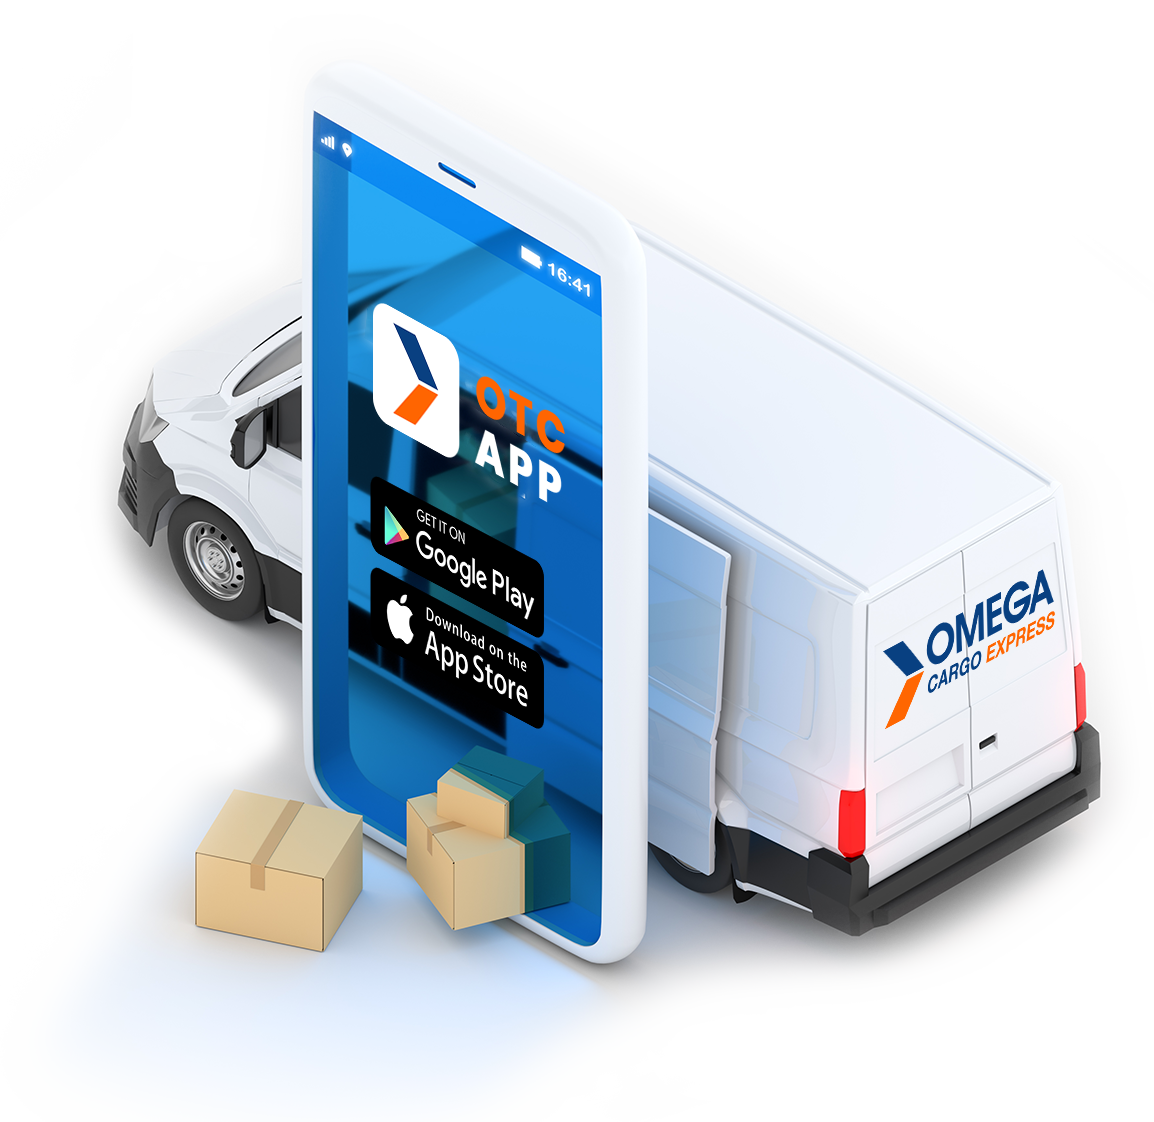 Omega Cargo App - International Shipping from Canada to Latin America| Omega Cargo Express